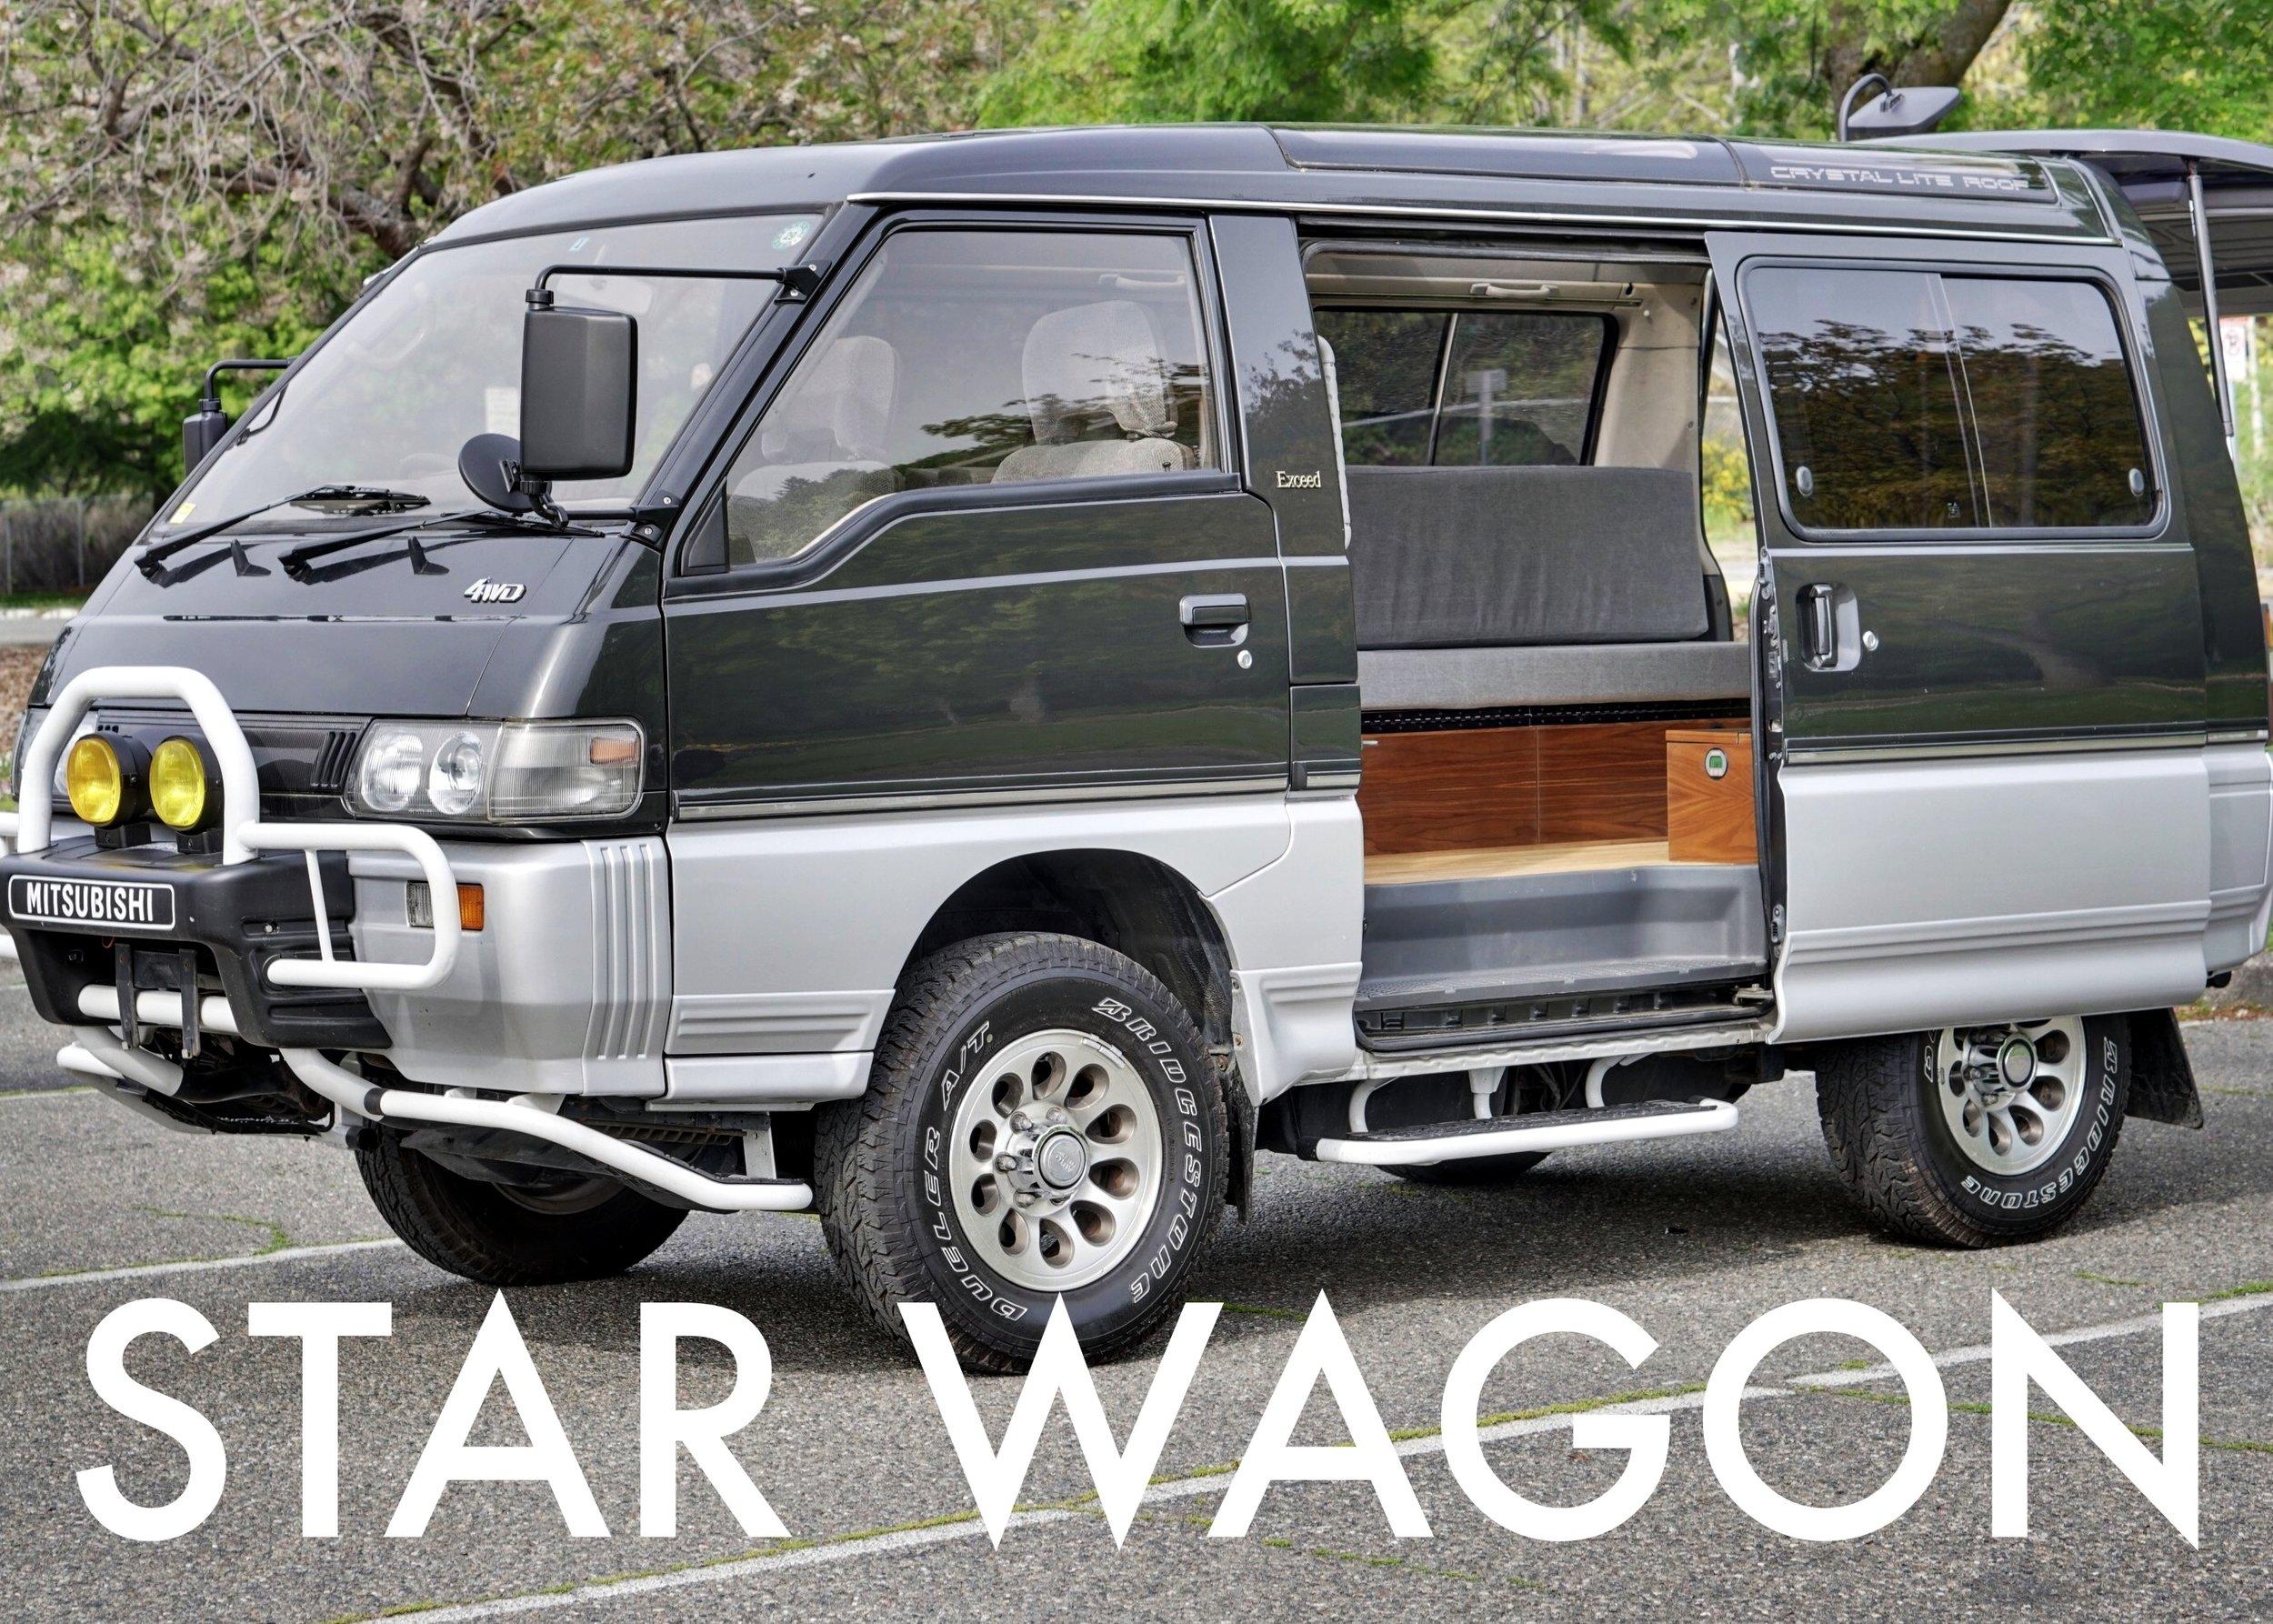 STARWAGON 5X7 CROP 2.jpg